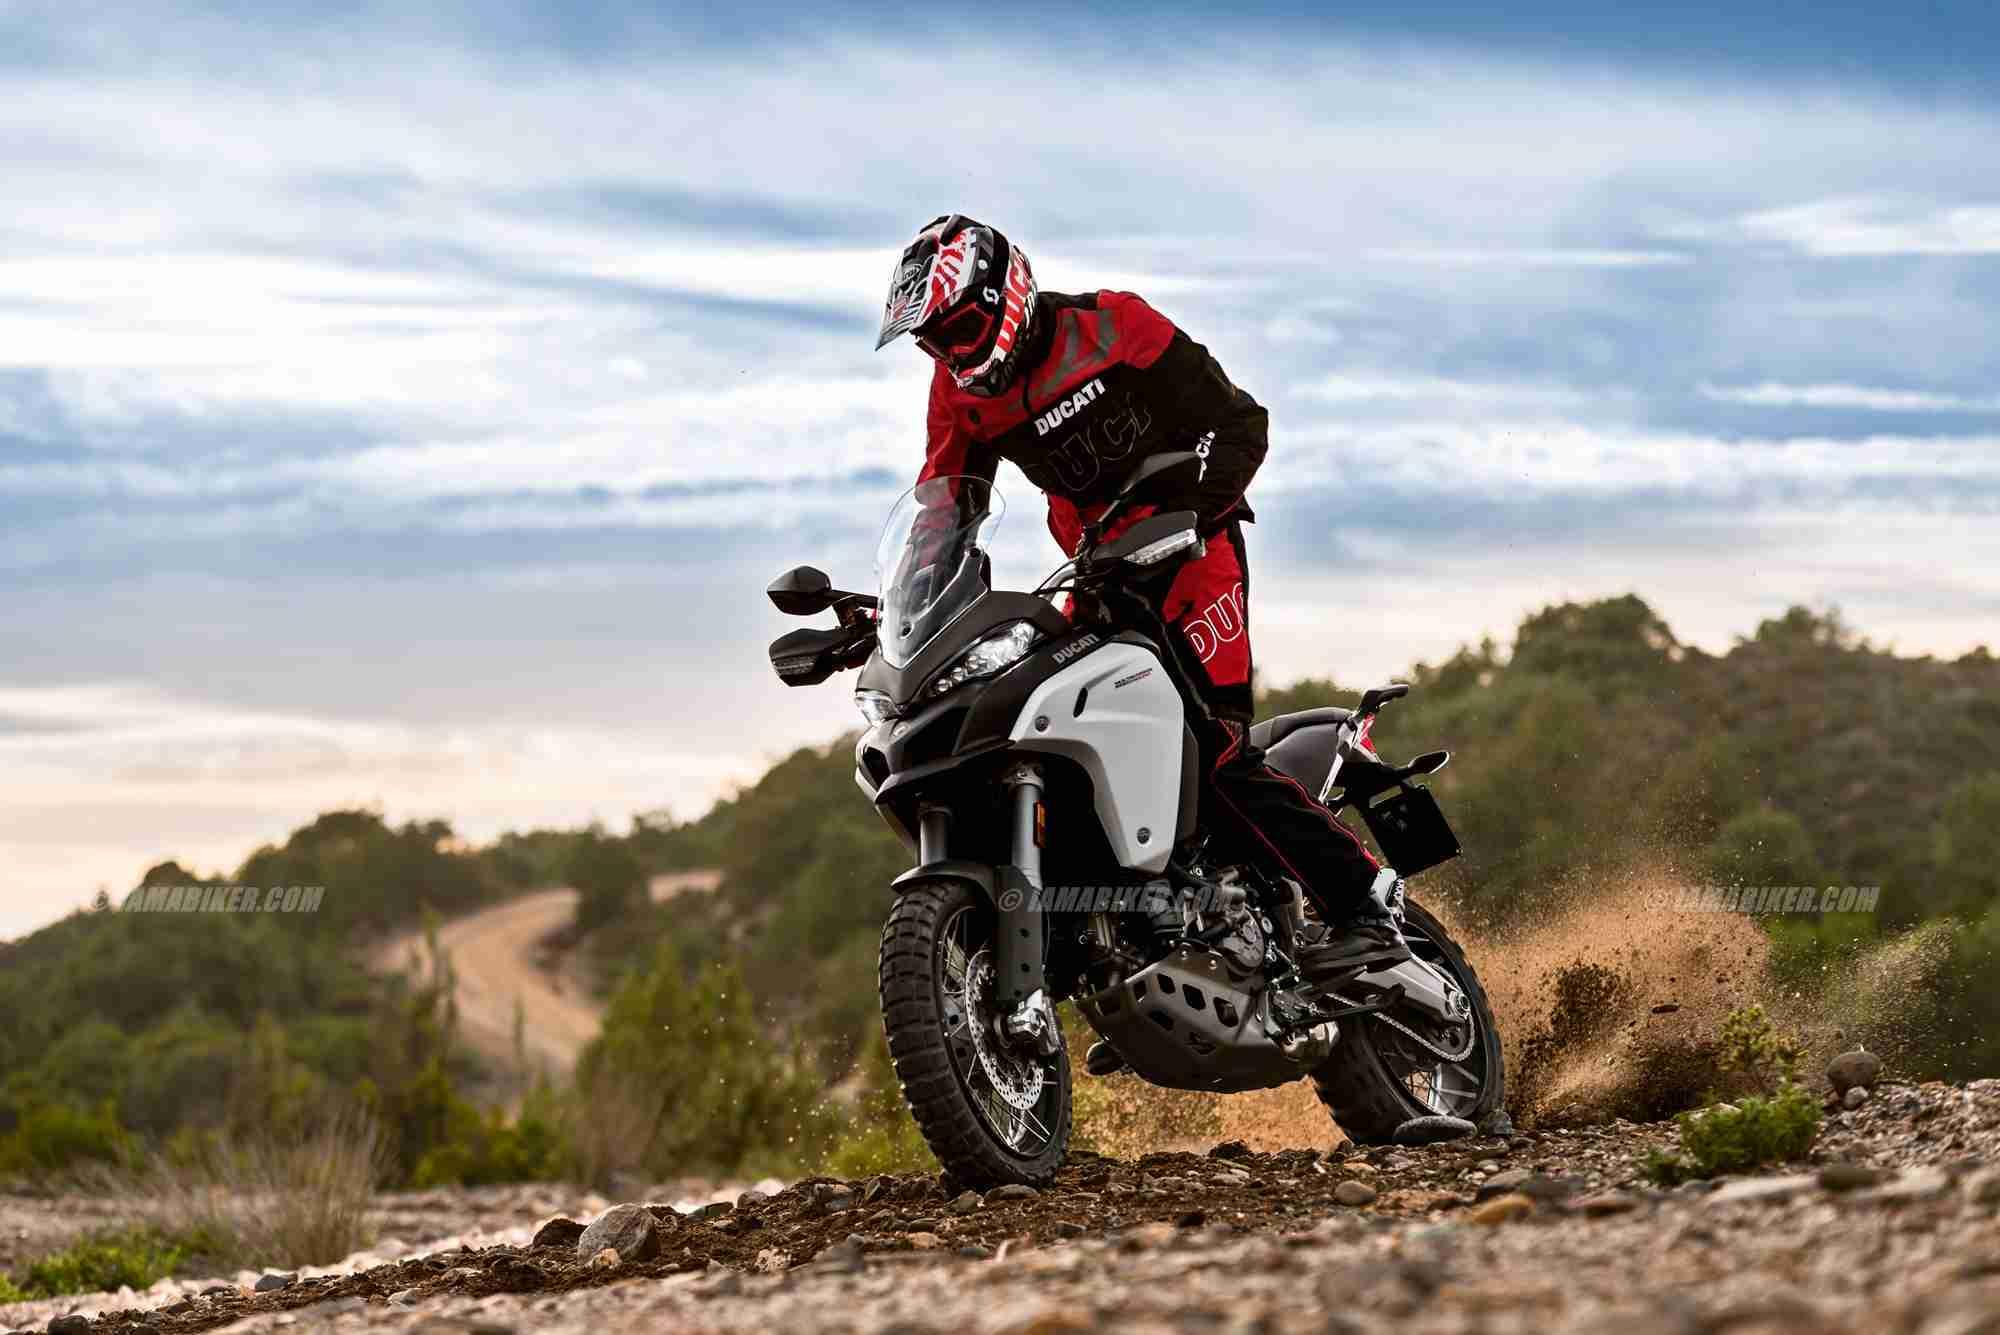 2016 Ducati MULTISTRADA 1200 ENDURO